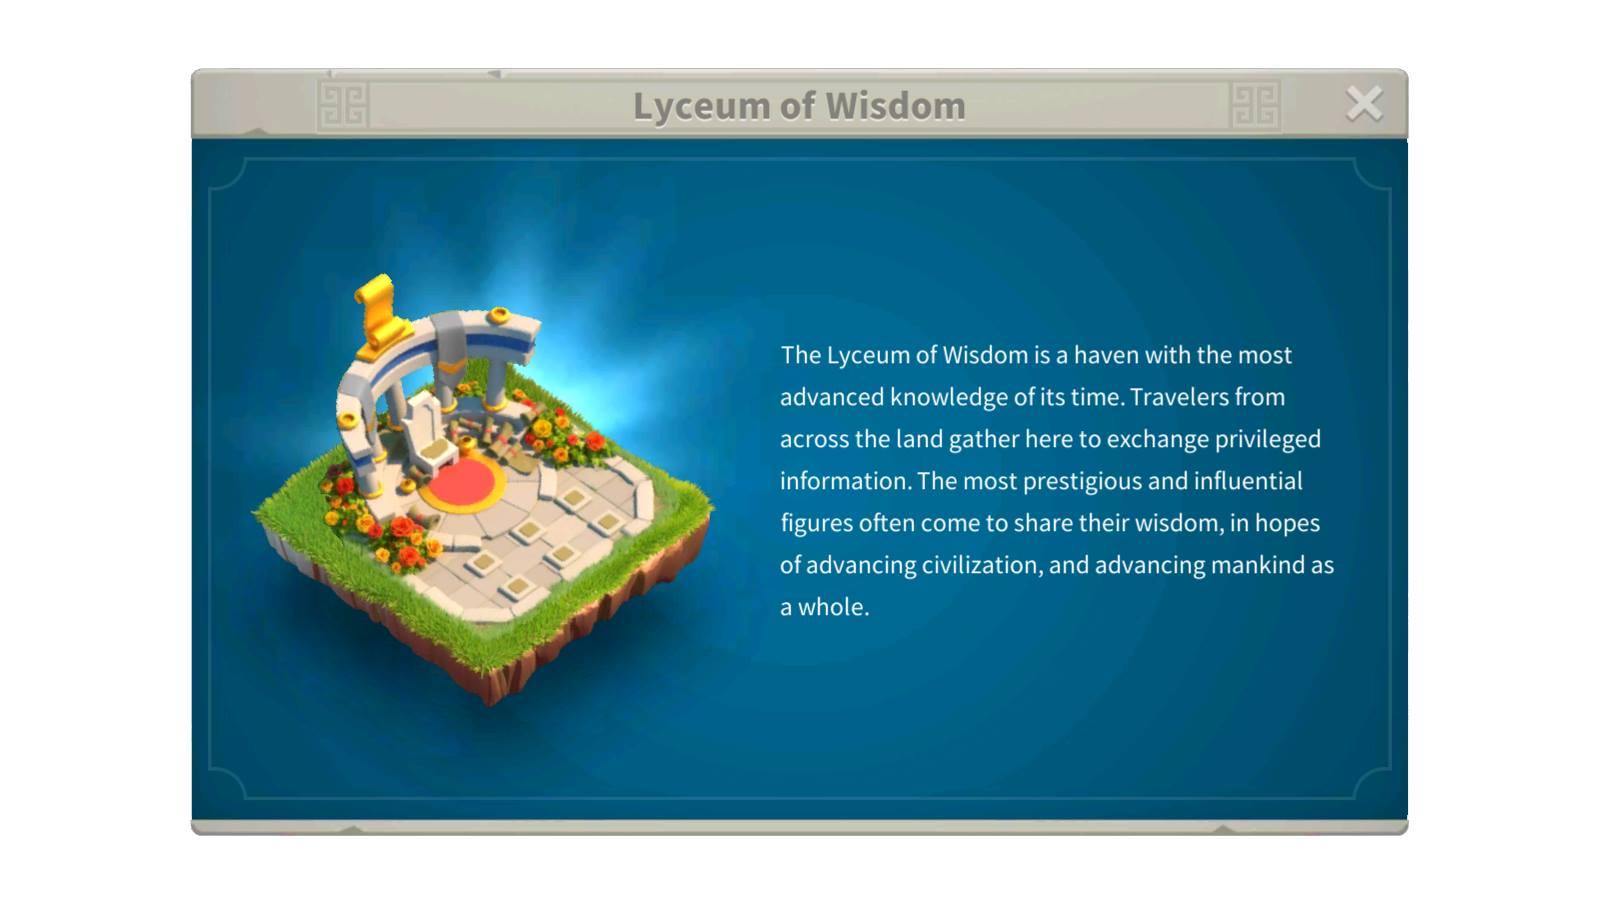 Lyceum of Wisdom